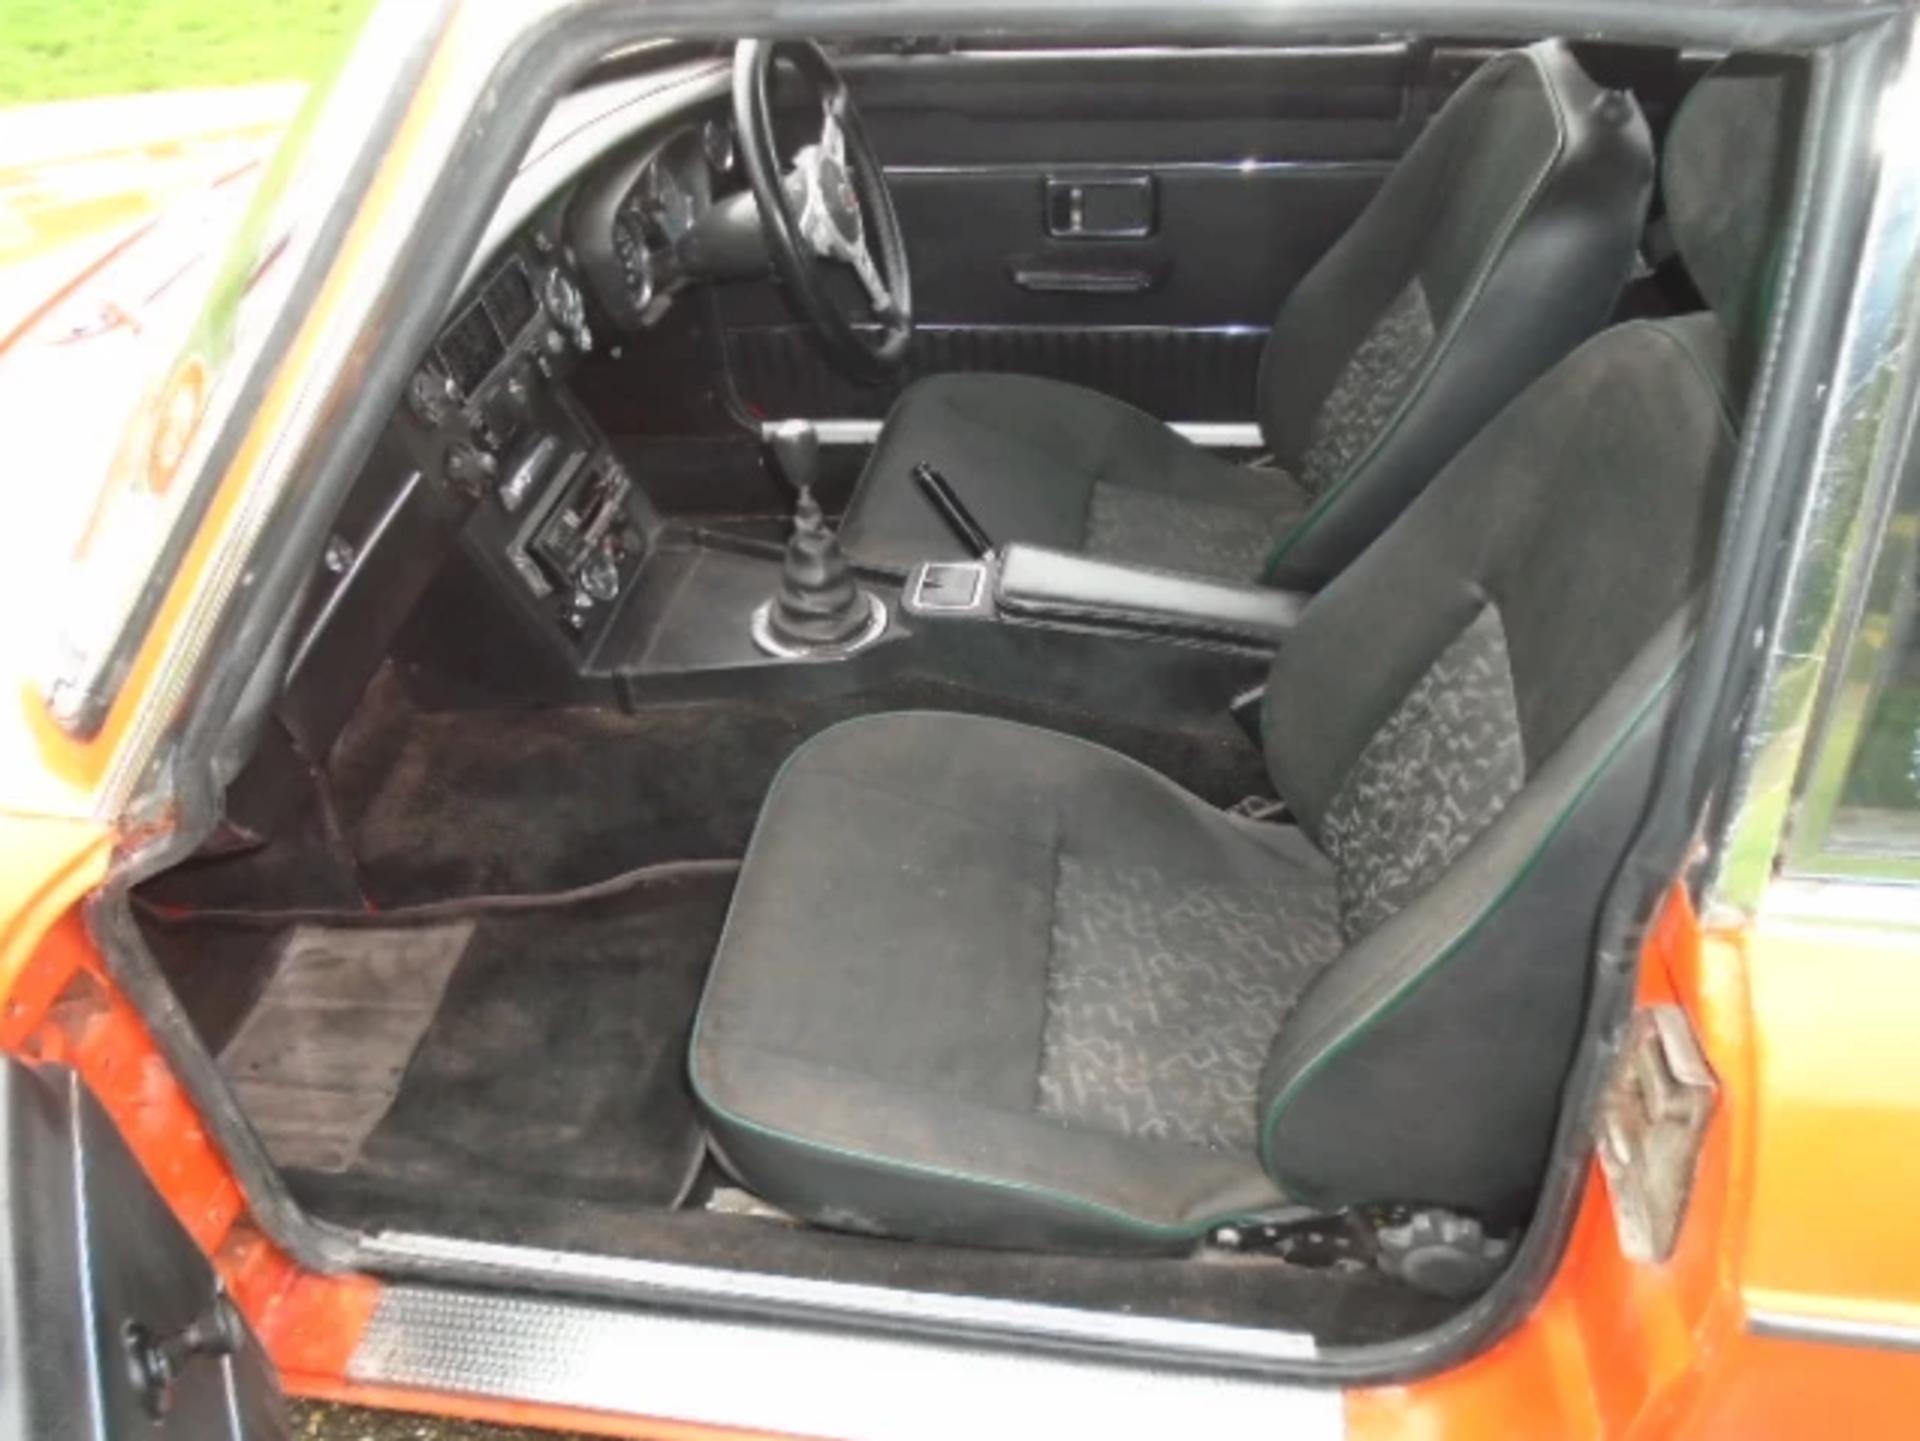 1973 MG B GT - Image 5 of 6